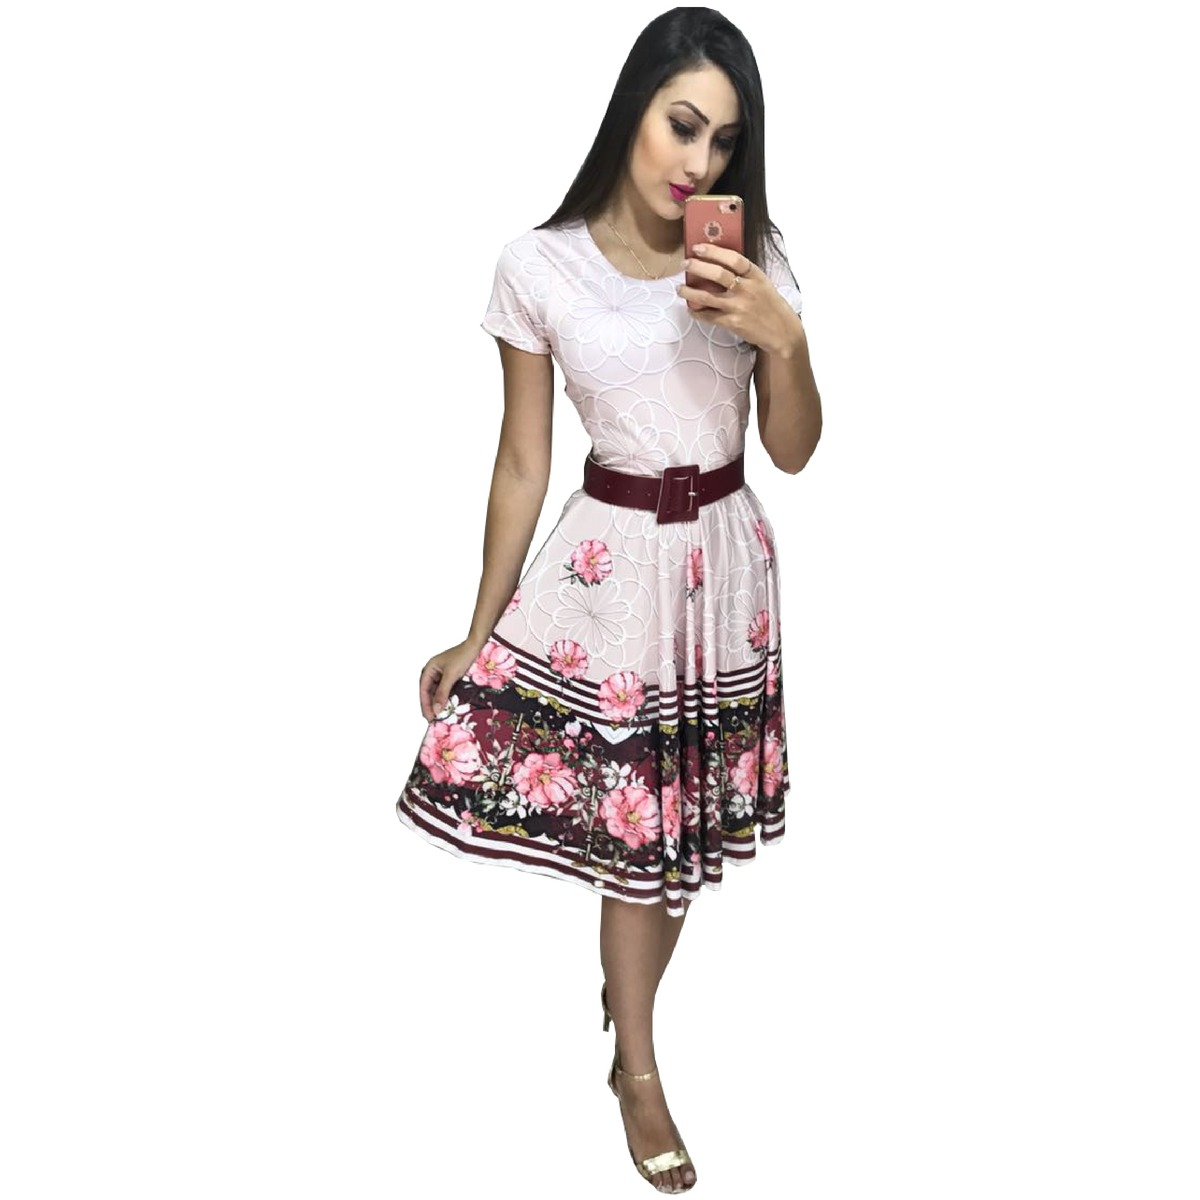 56e444db8a90 vestido feminino midi social floral moda gospel evangelica. Carregando zoom.